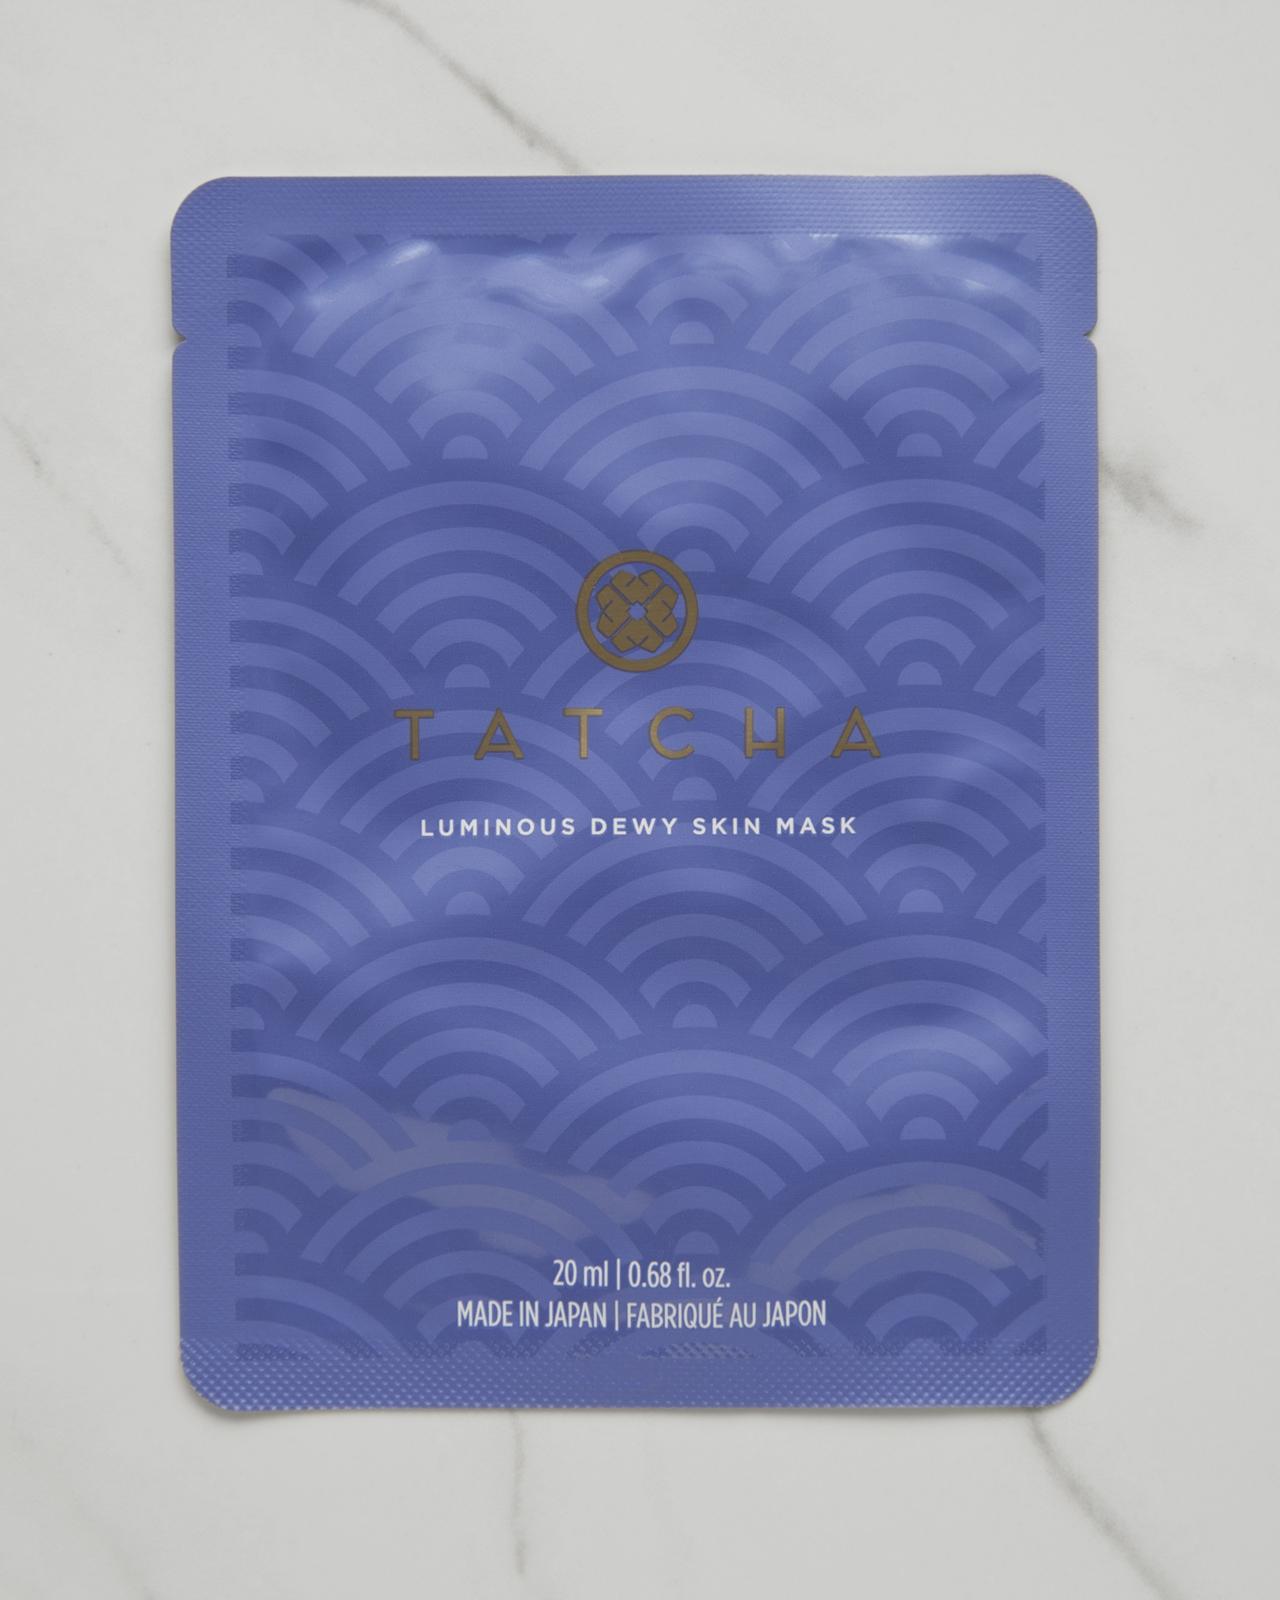 Tatcha Luminous Dewy Skin Sheet Mask $12